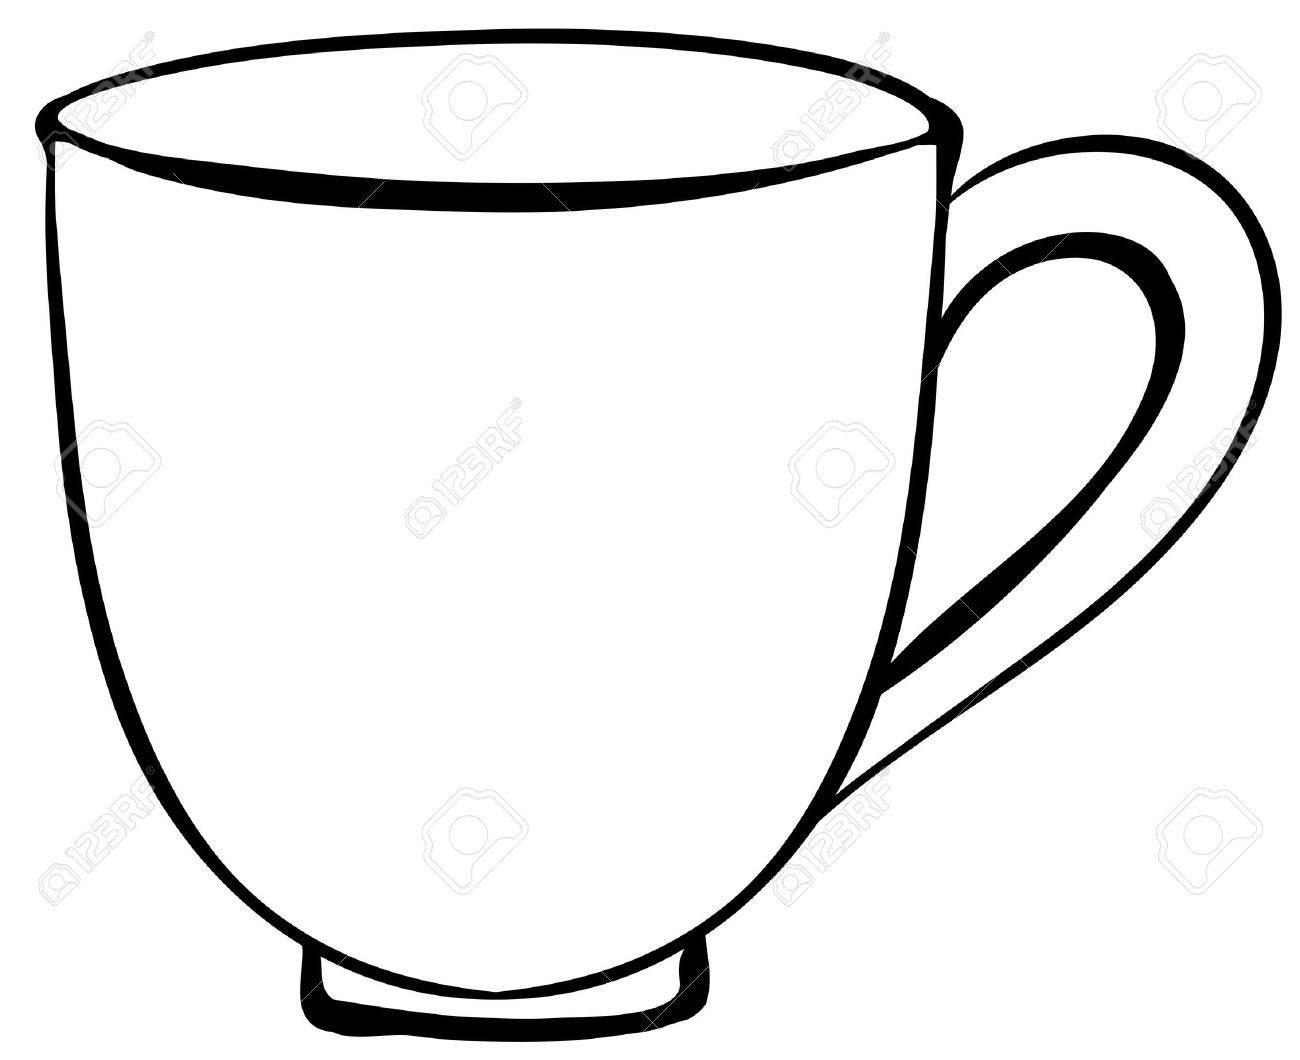 Closeup plain design of coffee cup.